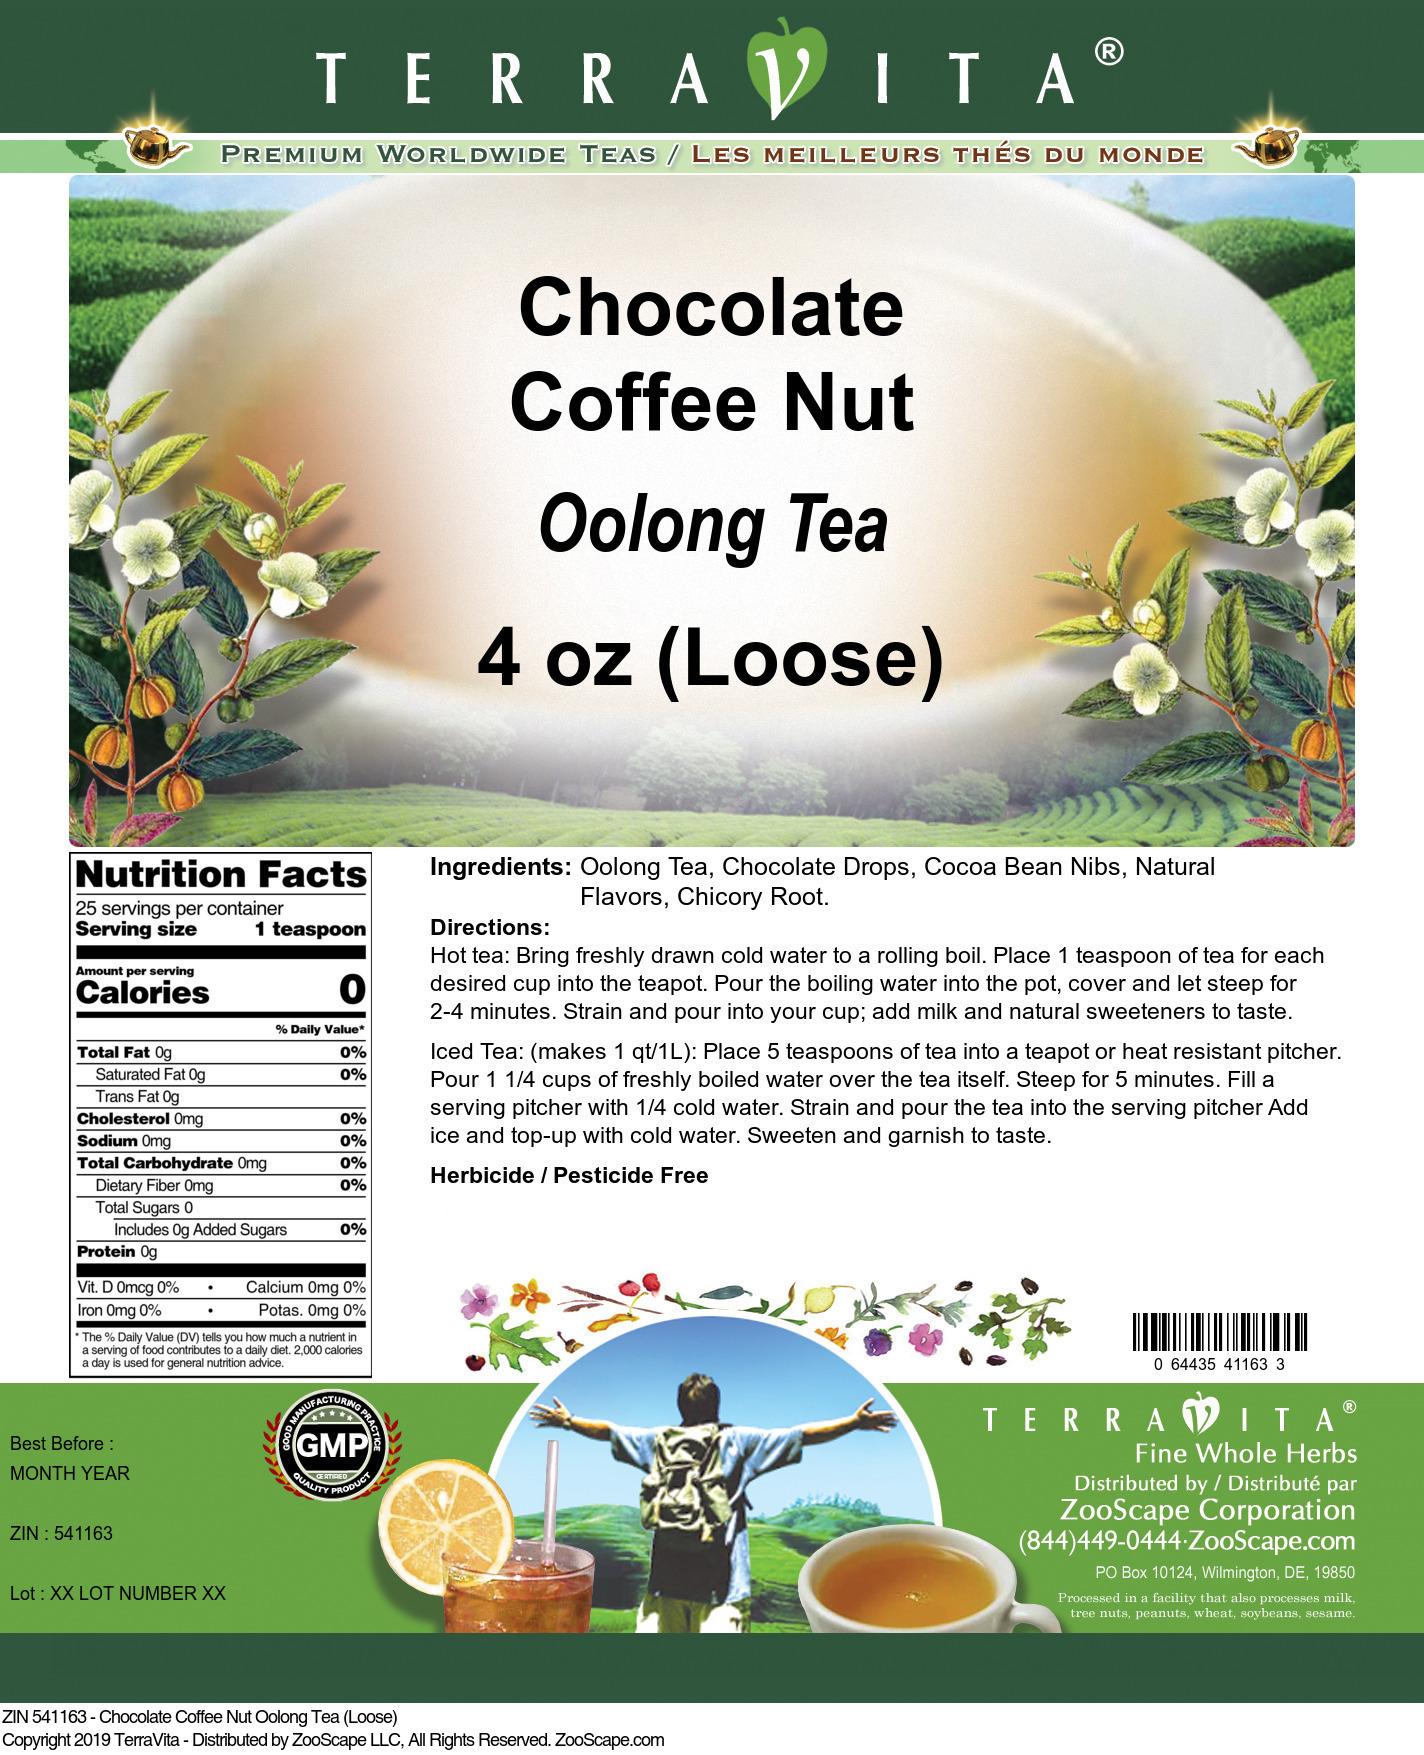 Chocolate Coffee Nut Oolong Tea (Loose)